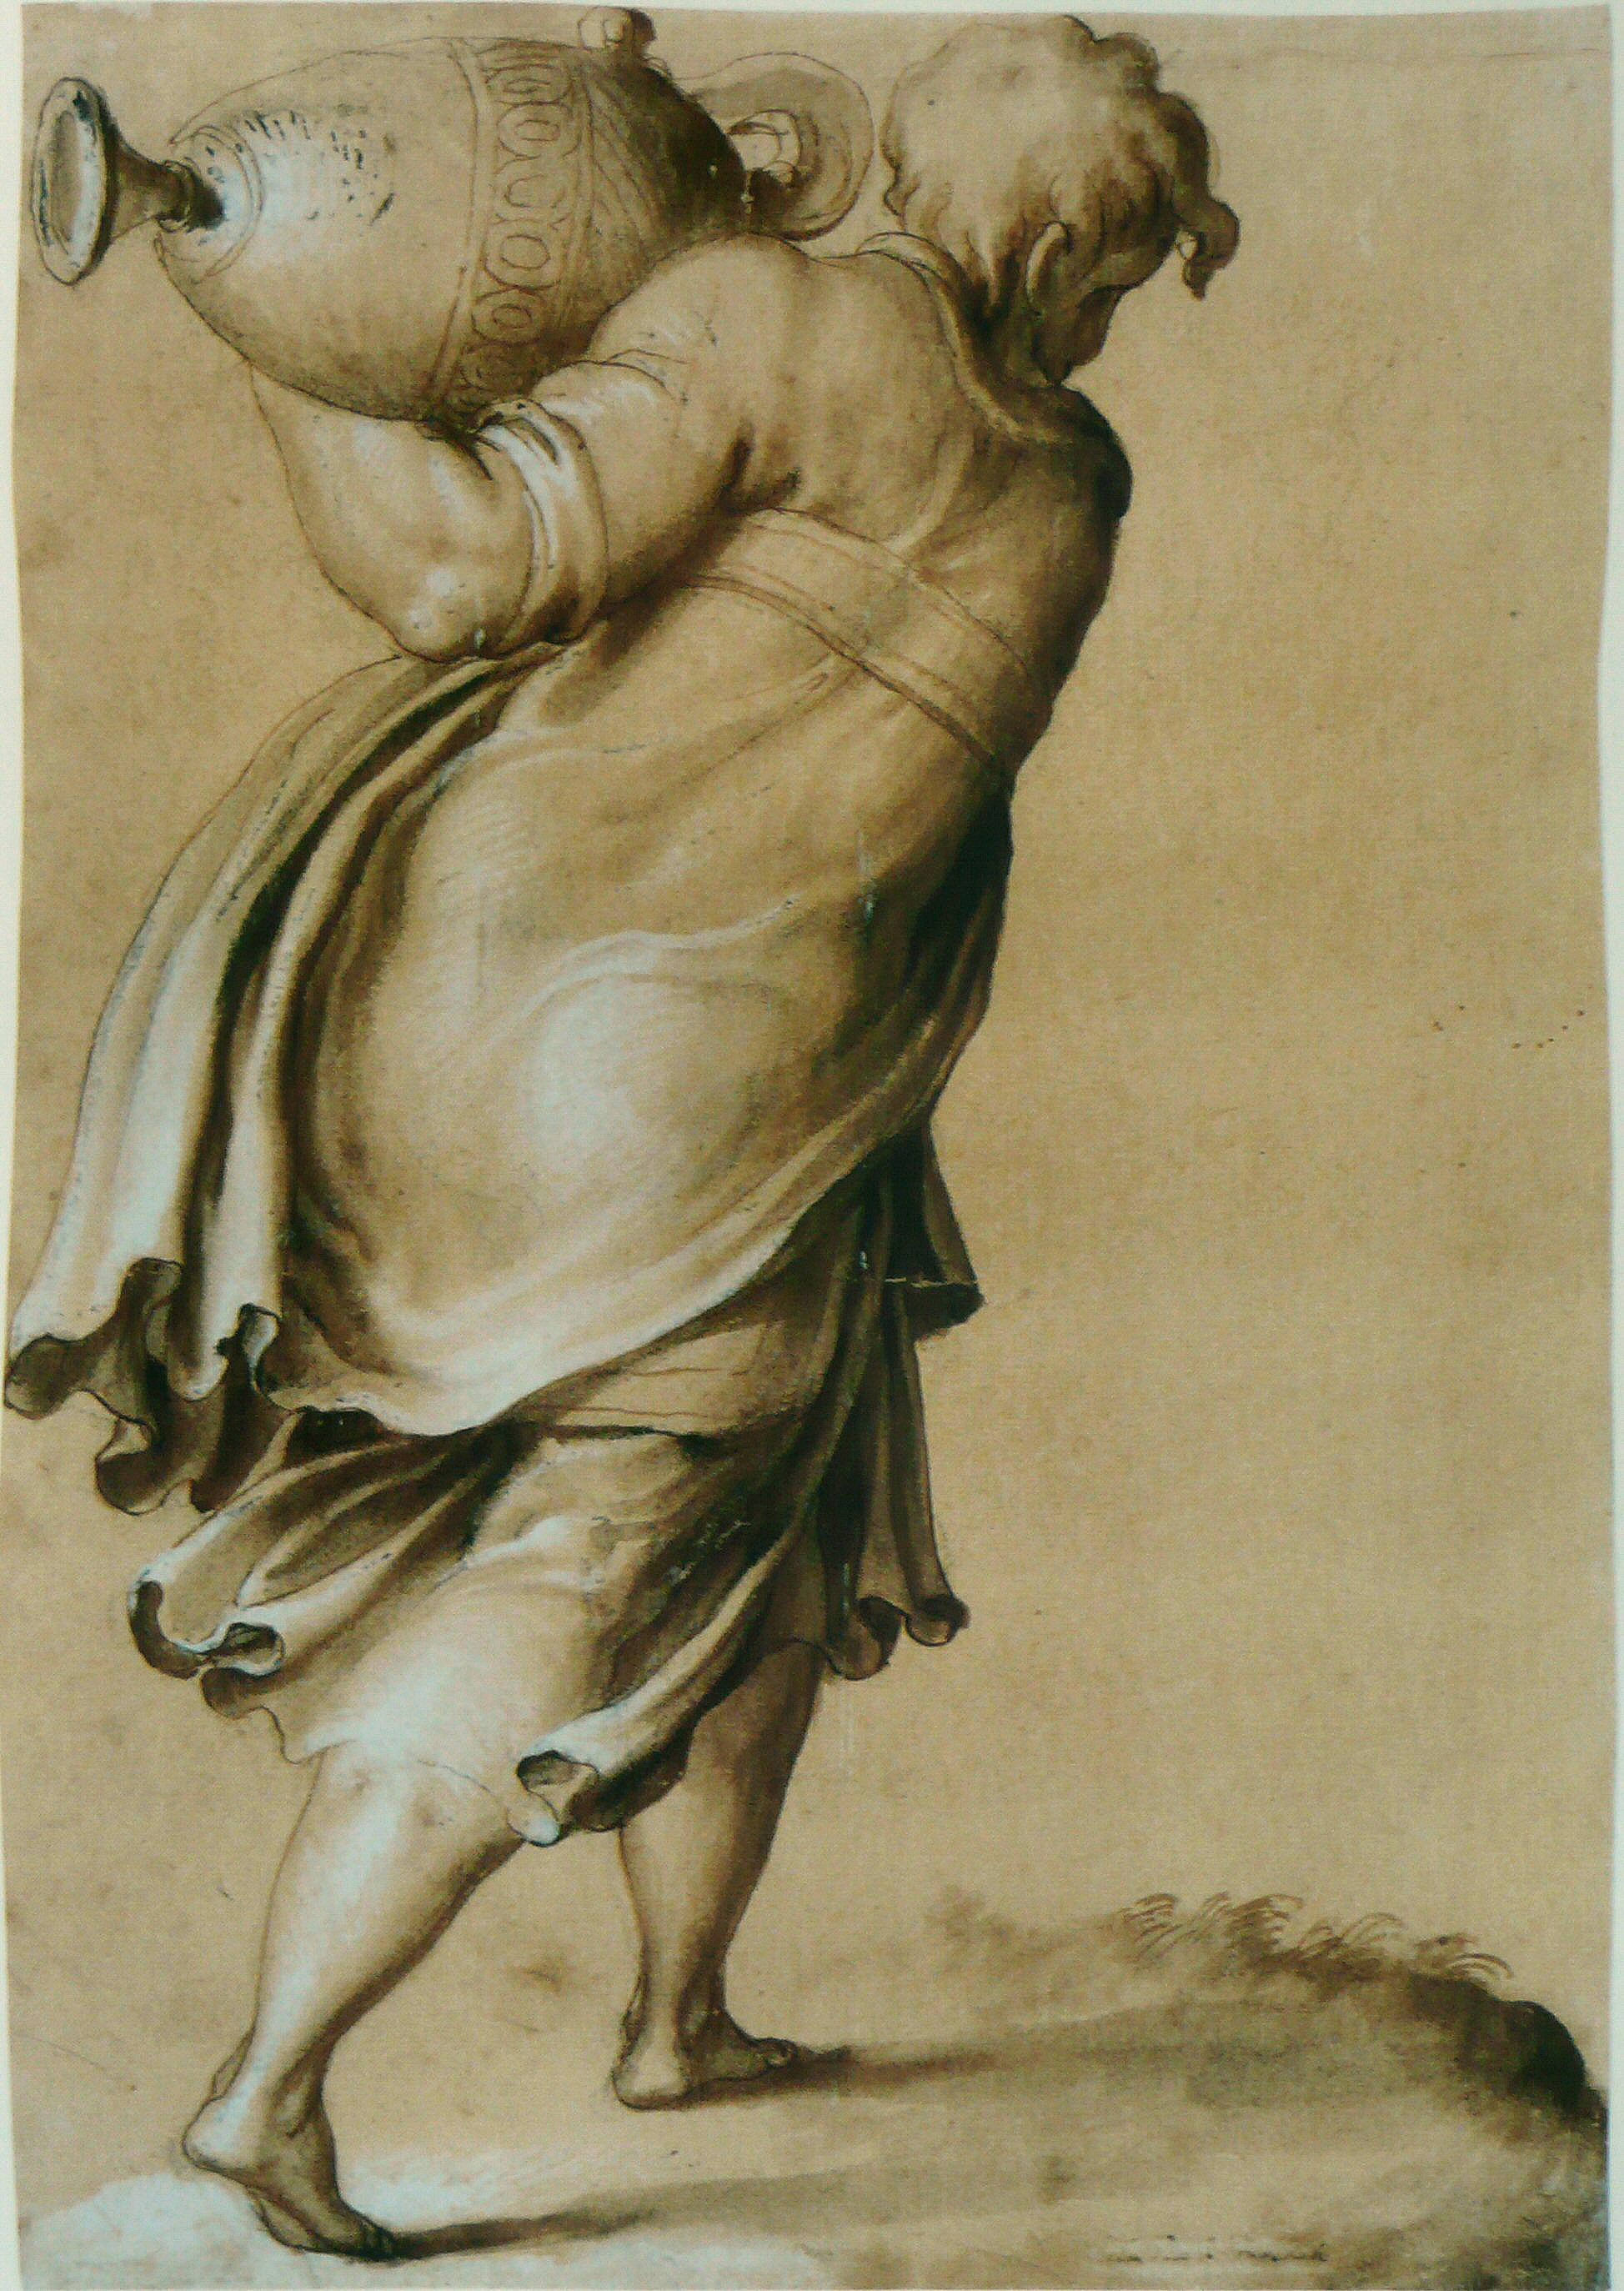 Francesco Salviati Drawings File:francesco Salviati